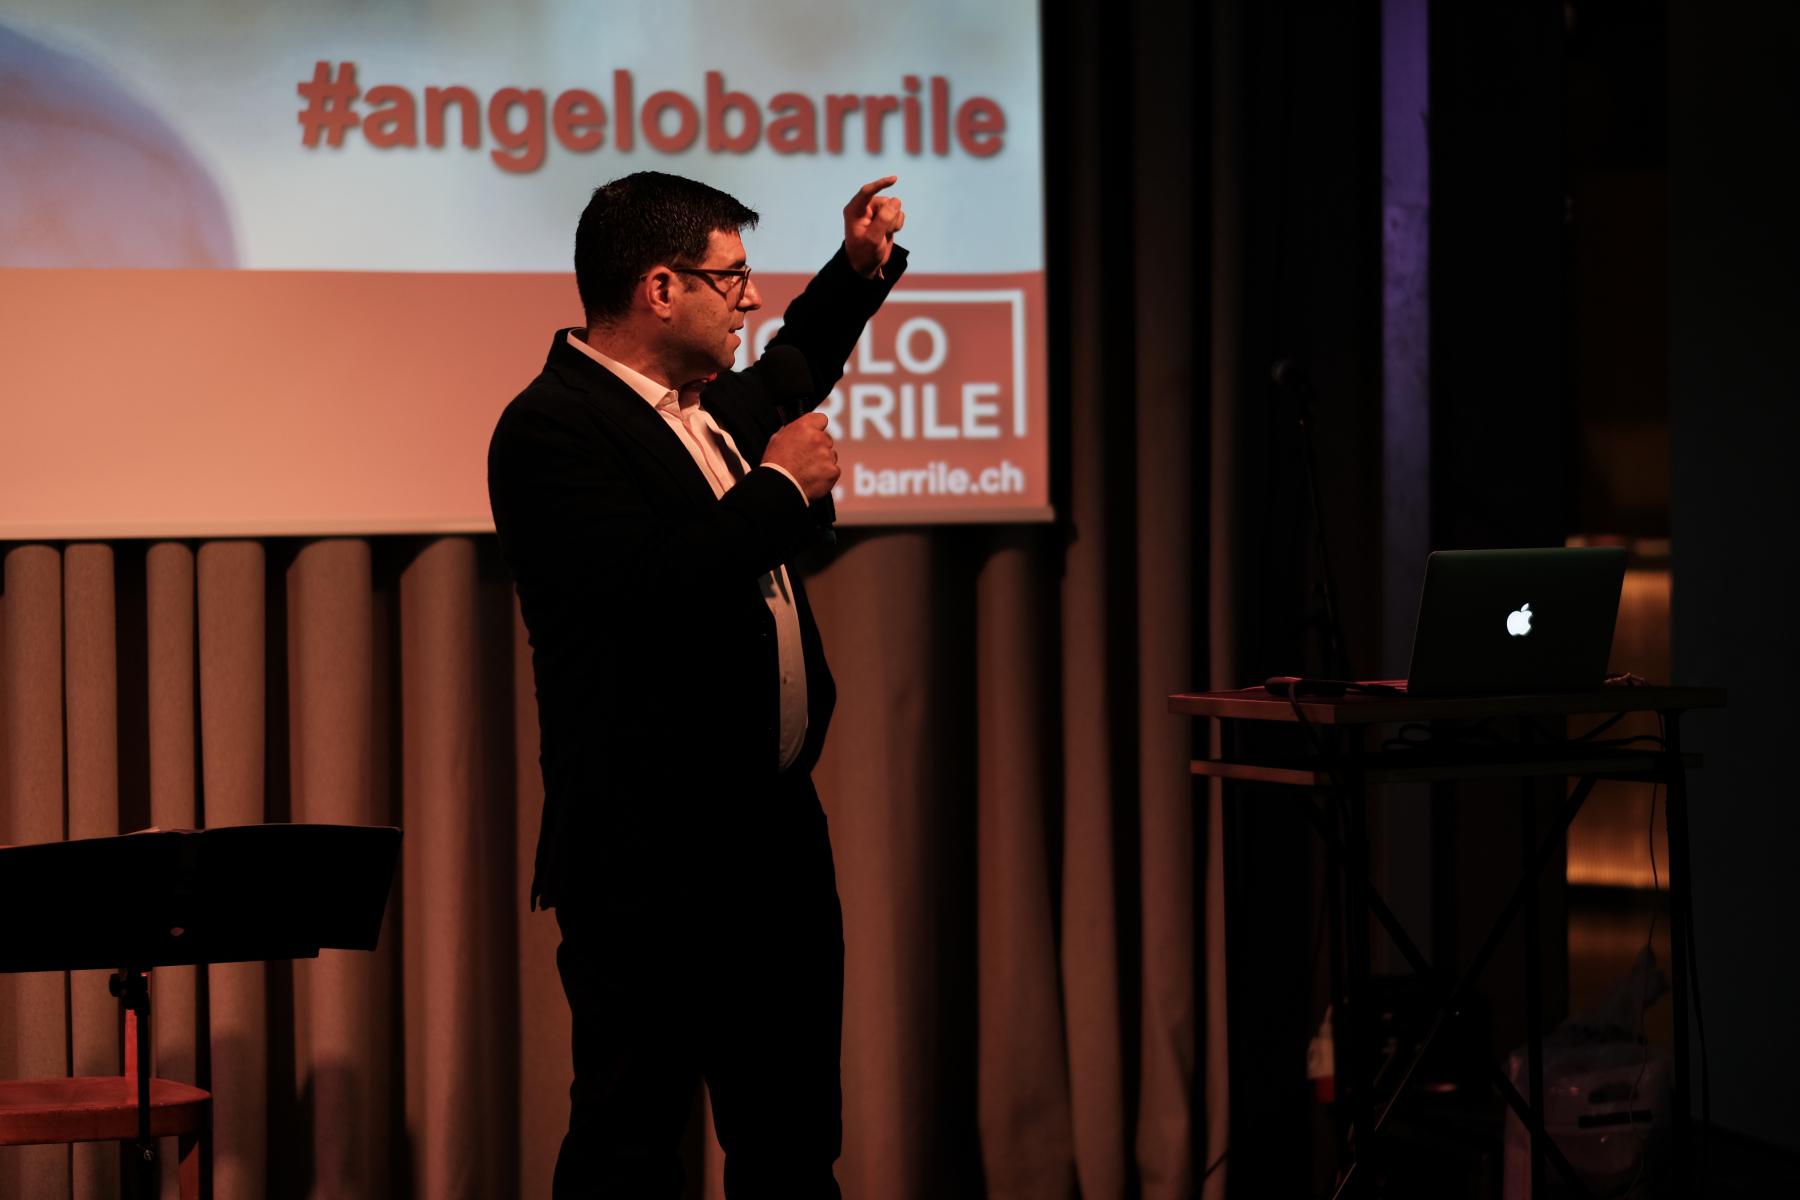 #angelobarrile: Ab sofort nutzbar!